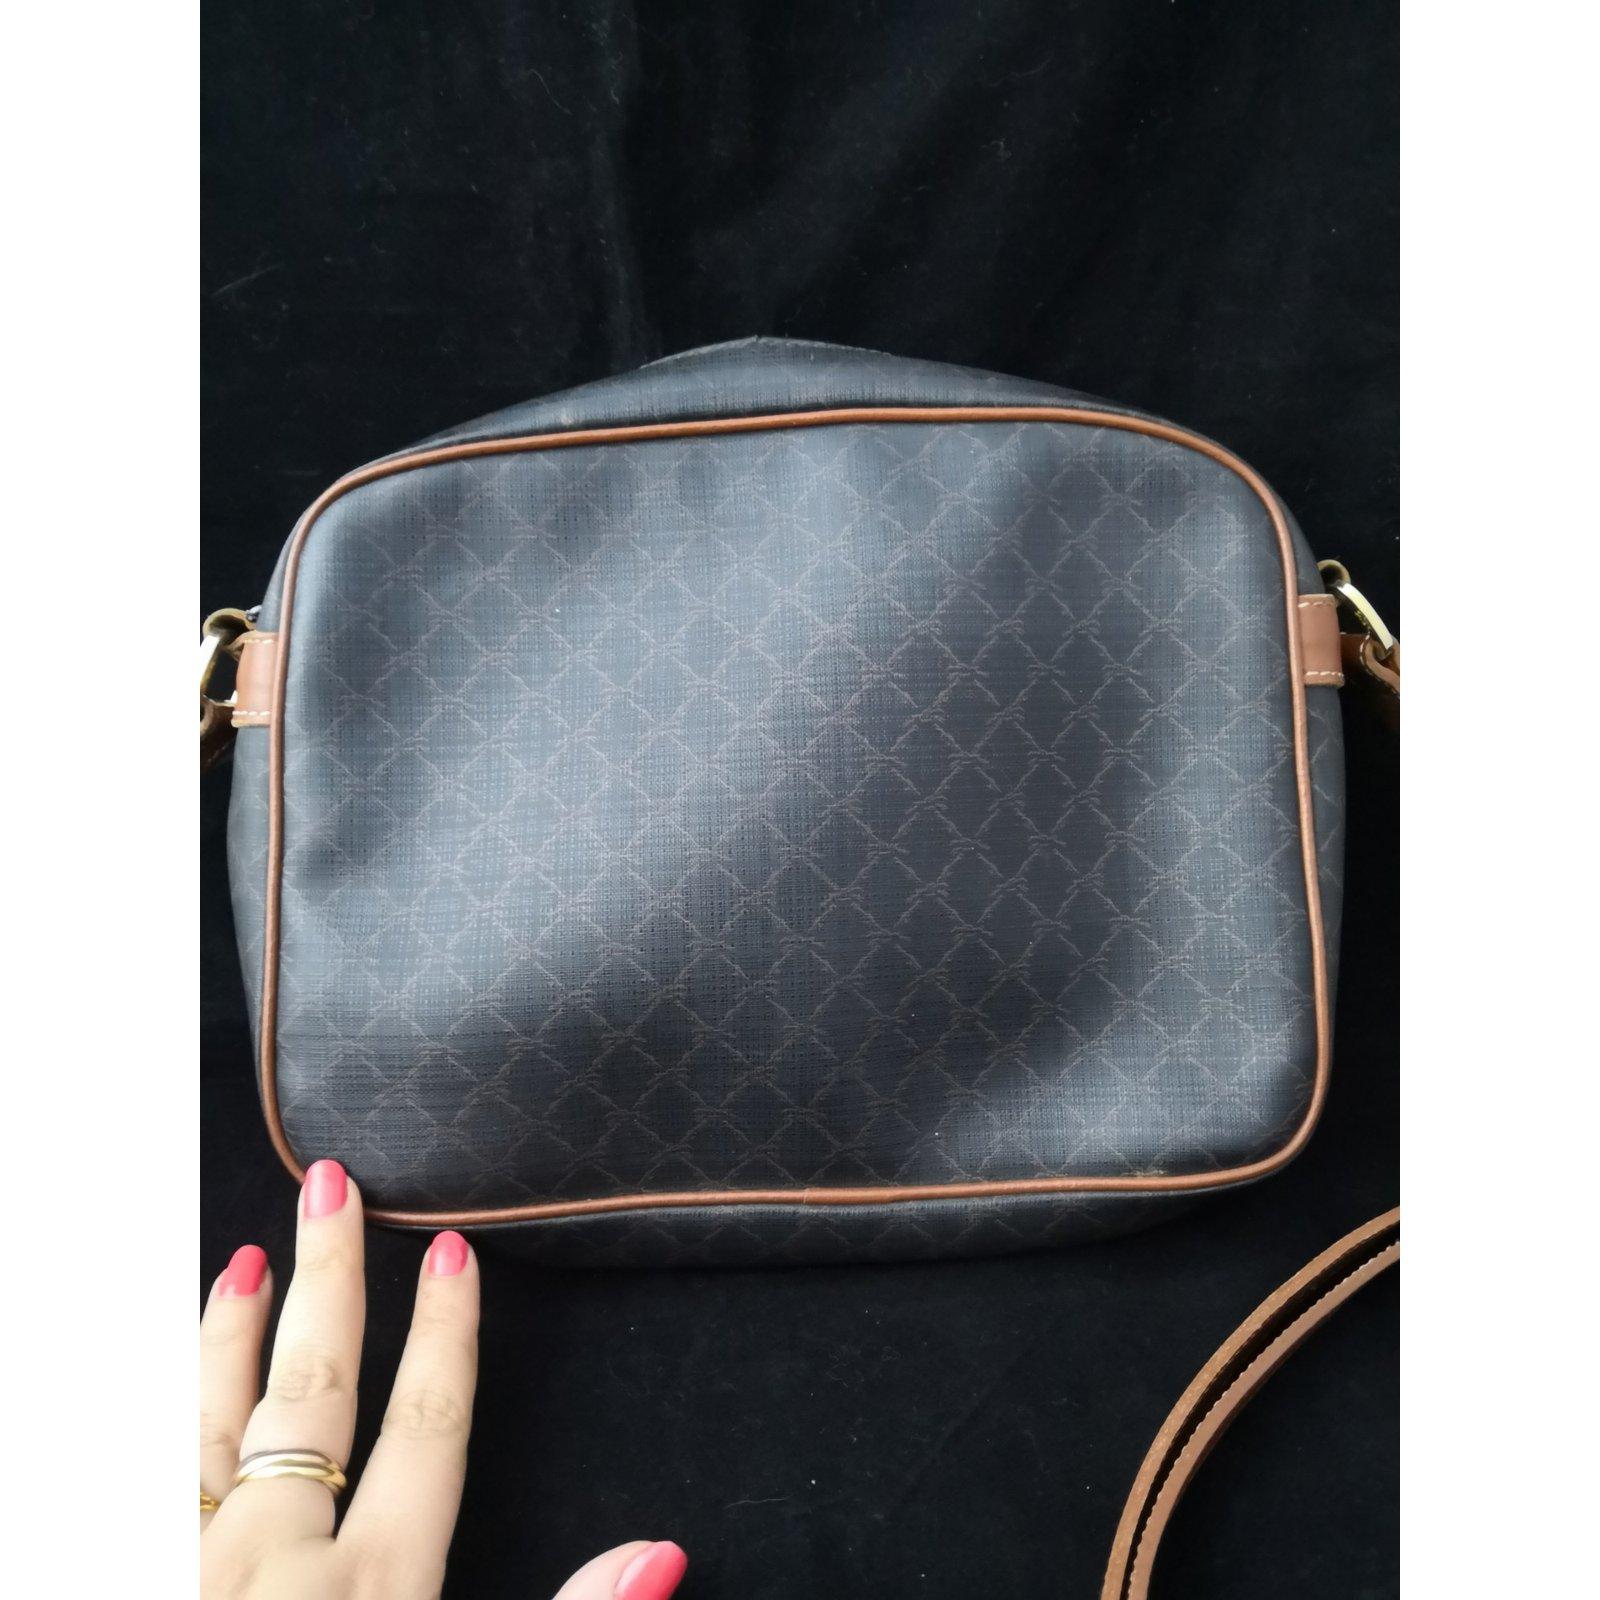 Vintage Longchamp gris Joli Ref 107821 Cuir Noir Sacs Closet À Sac Main toile caramel RnZXZ